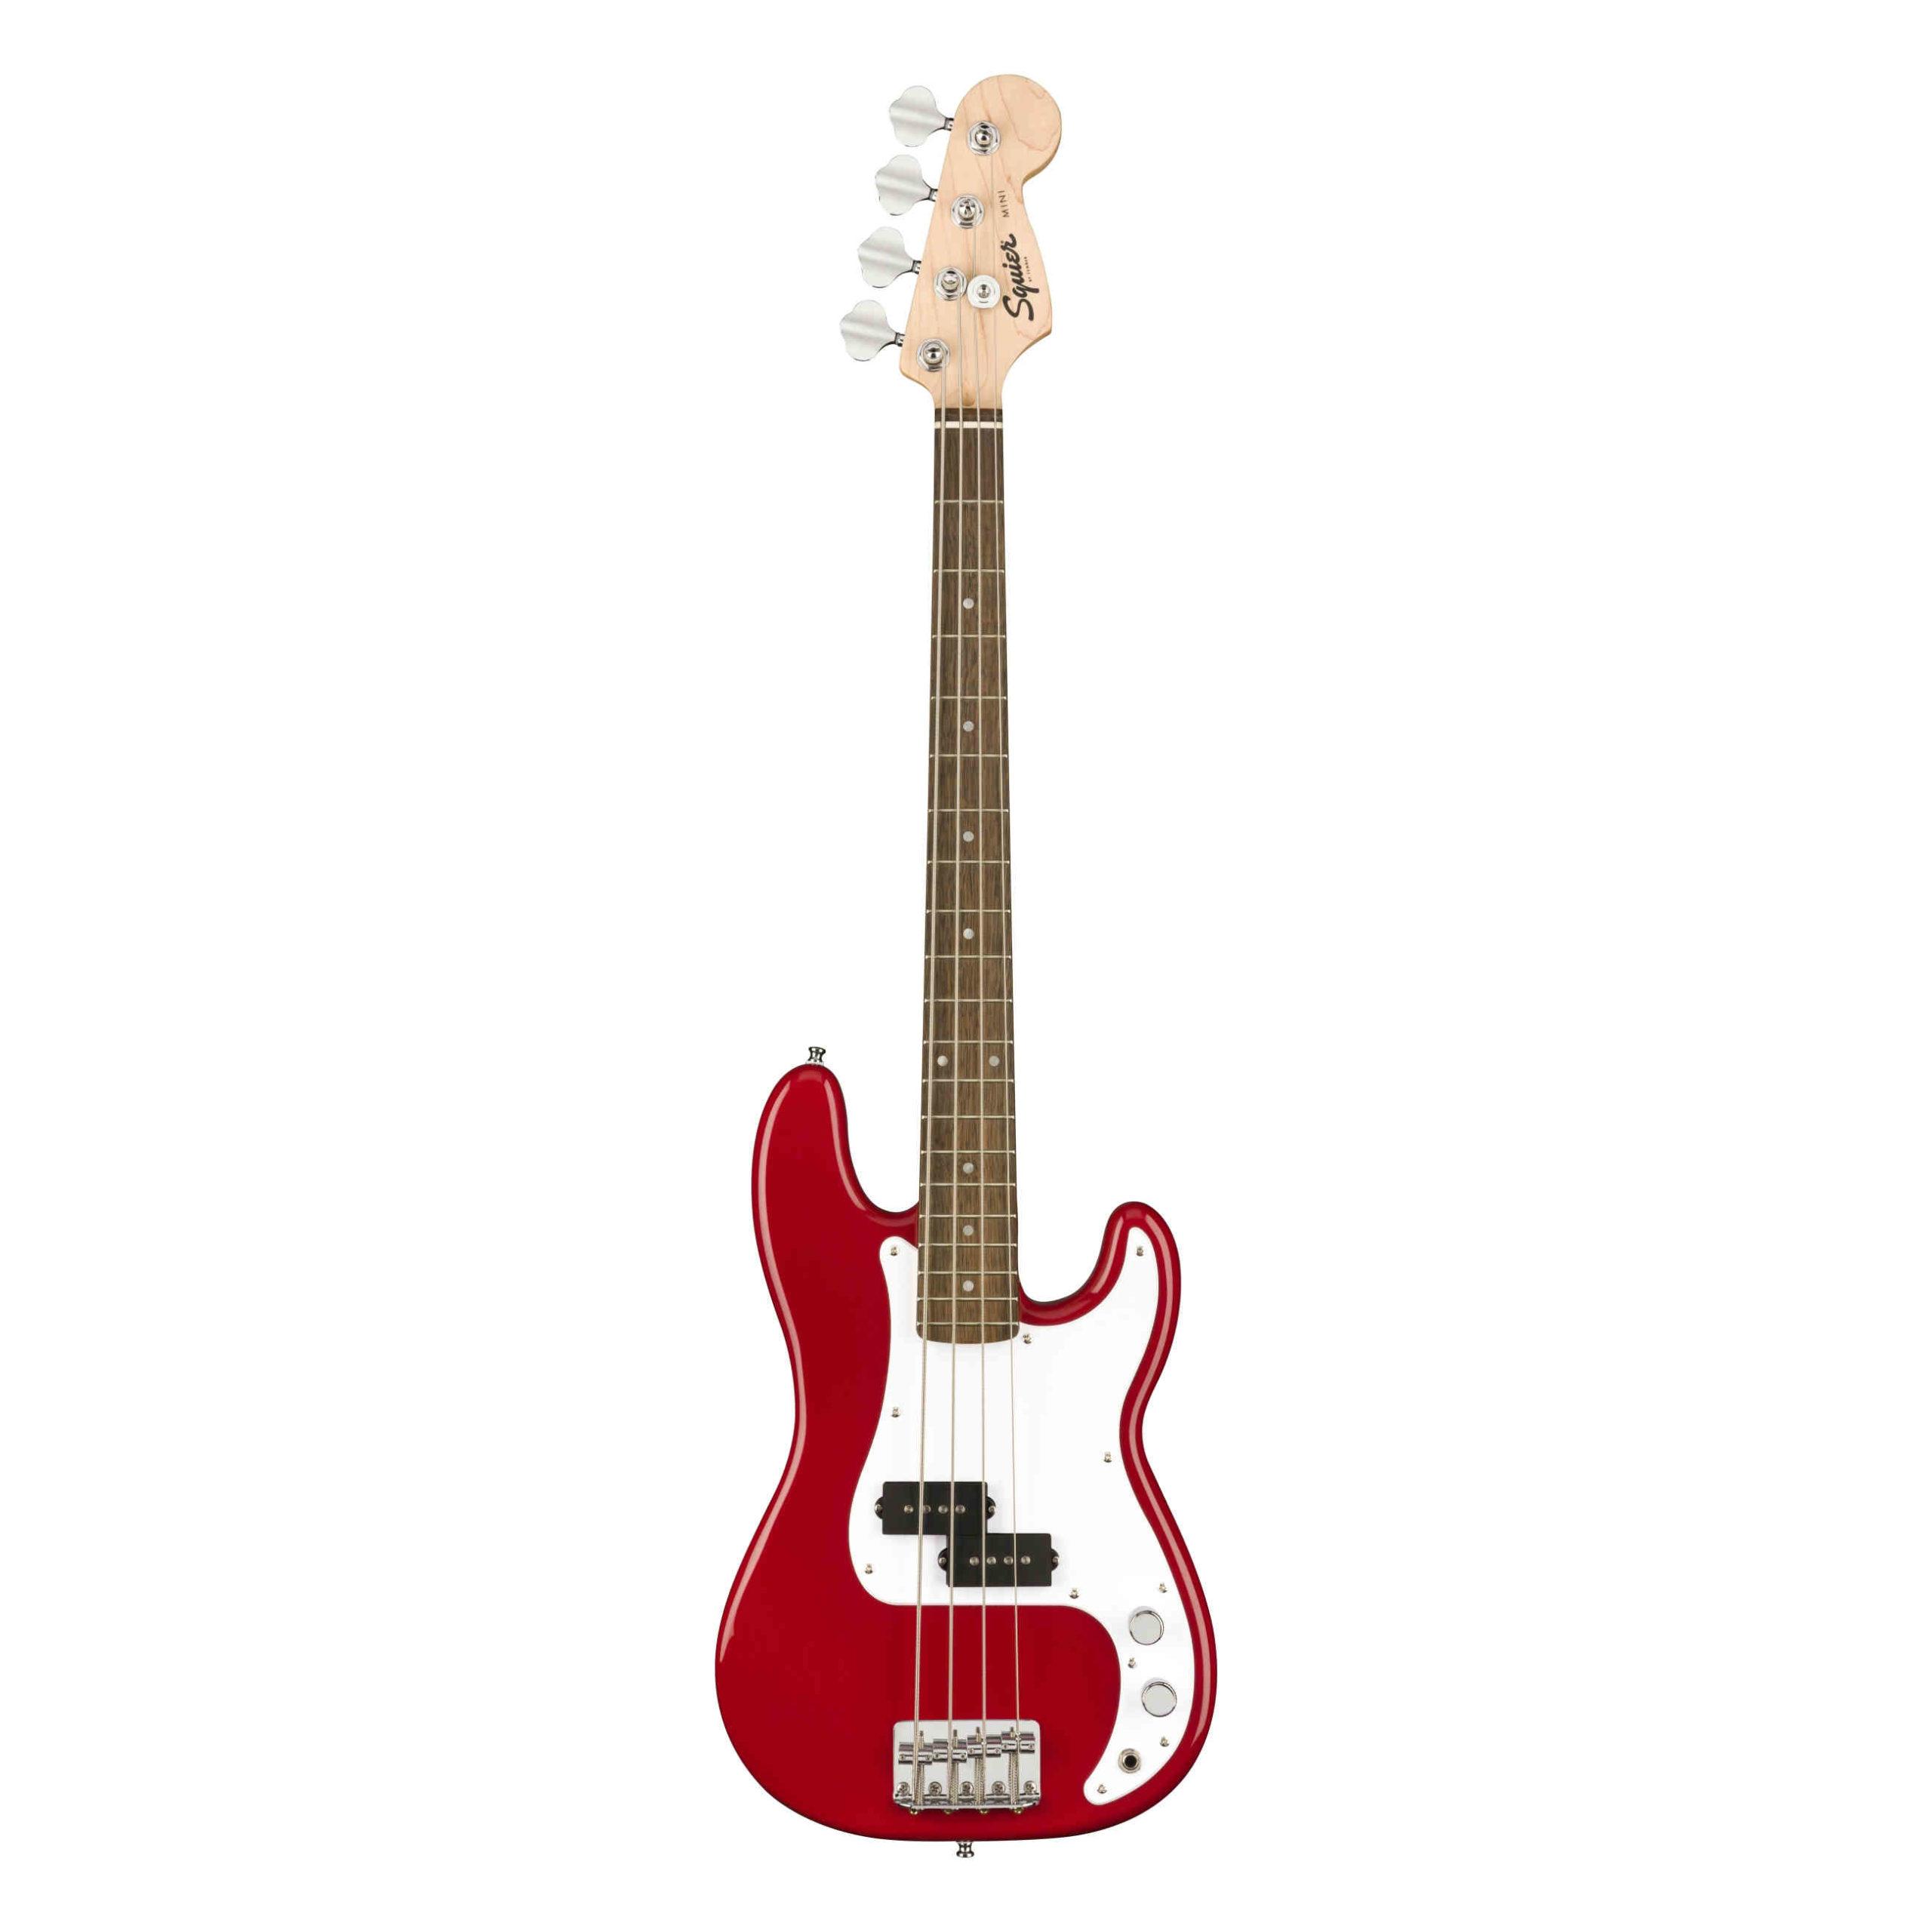 Squier Mini Precision Bass®, Laurel Fingerboard, Dakota Red